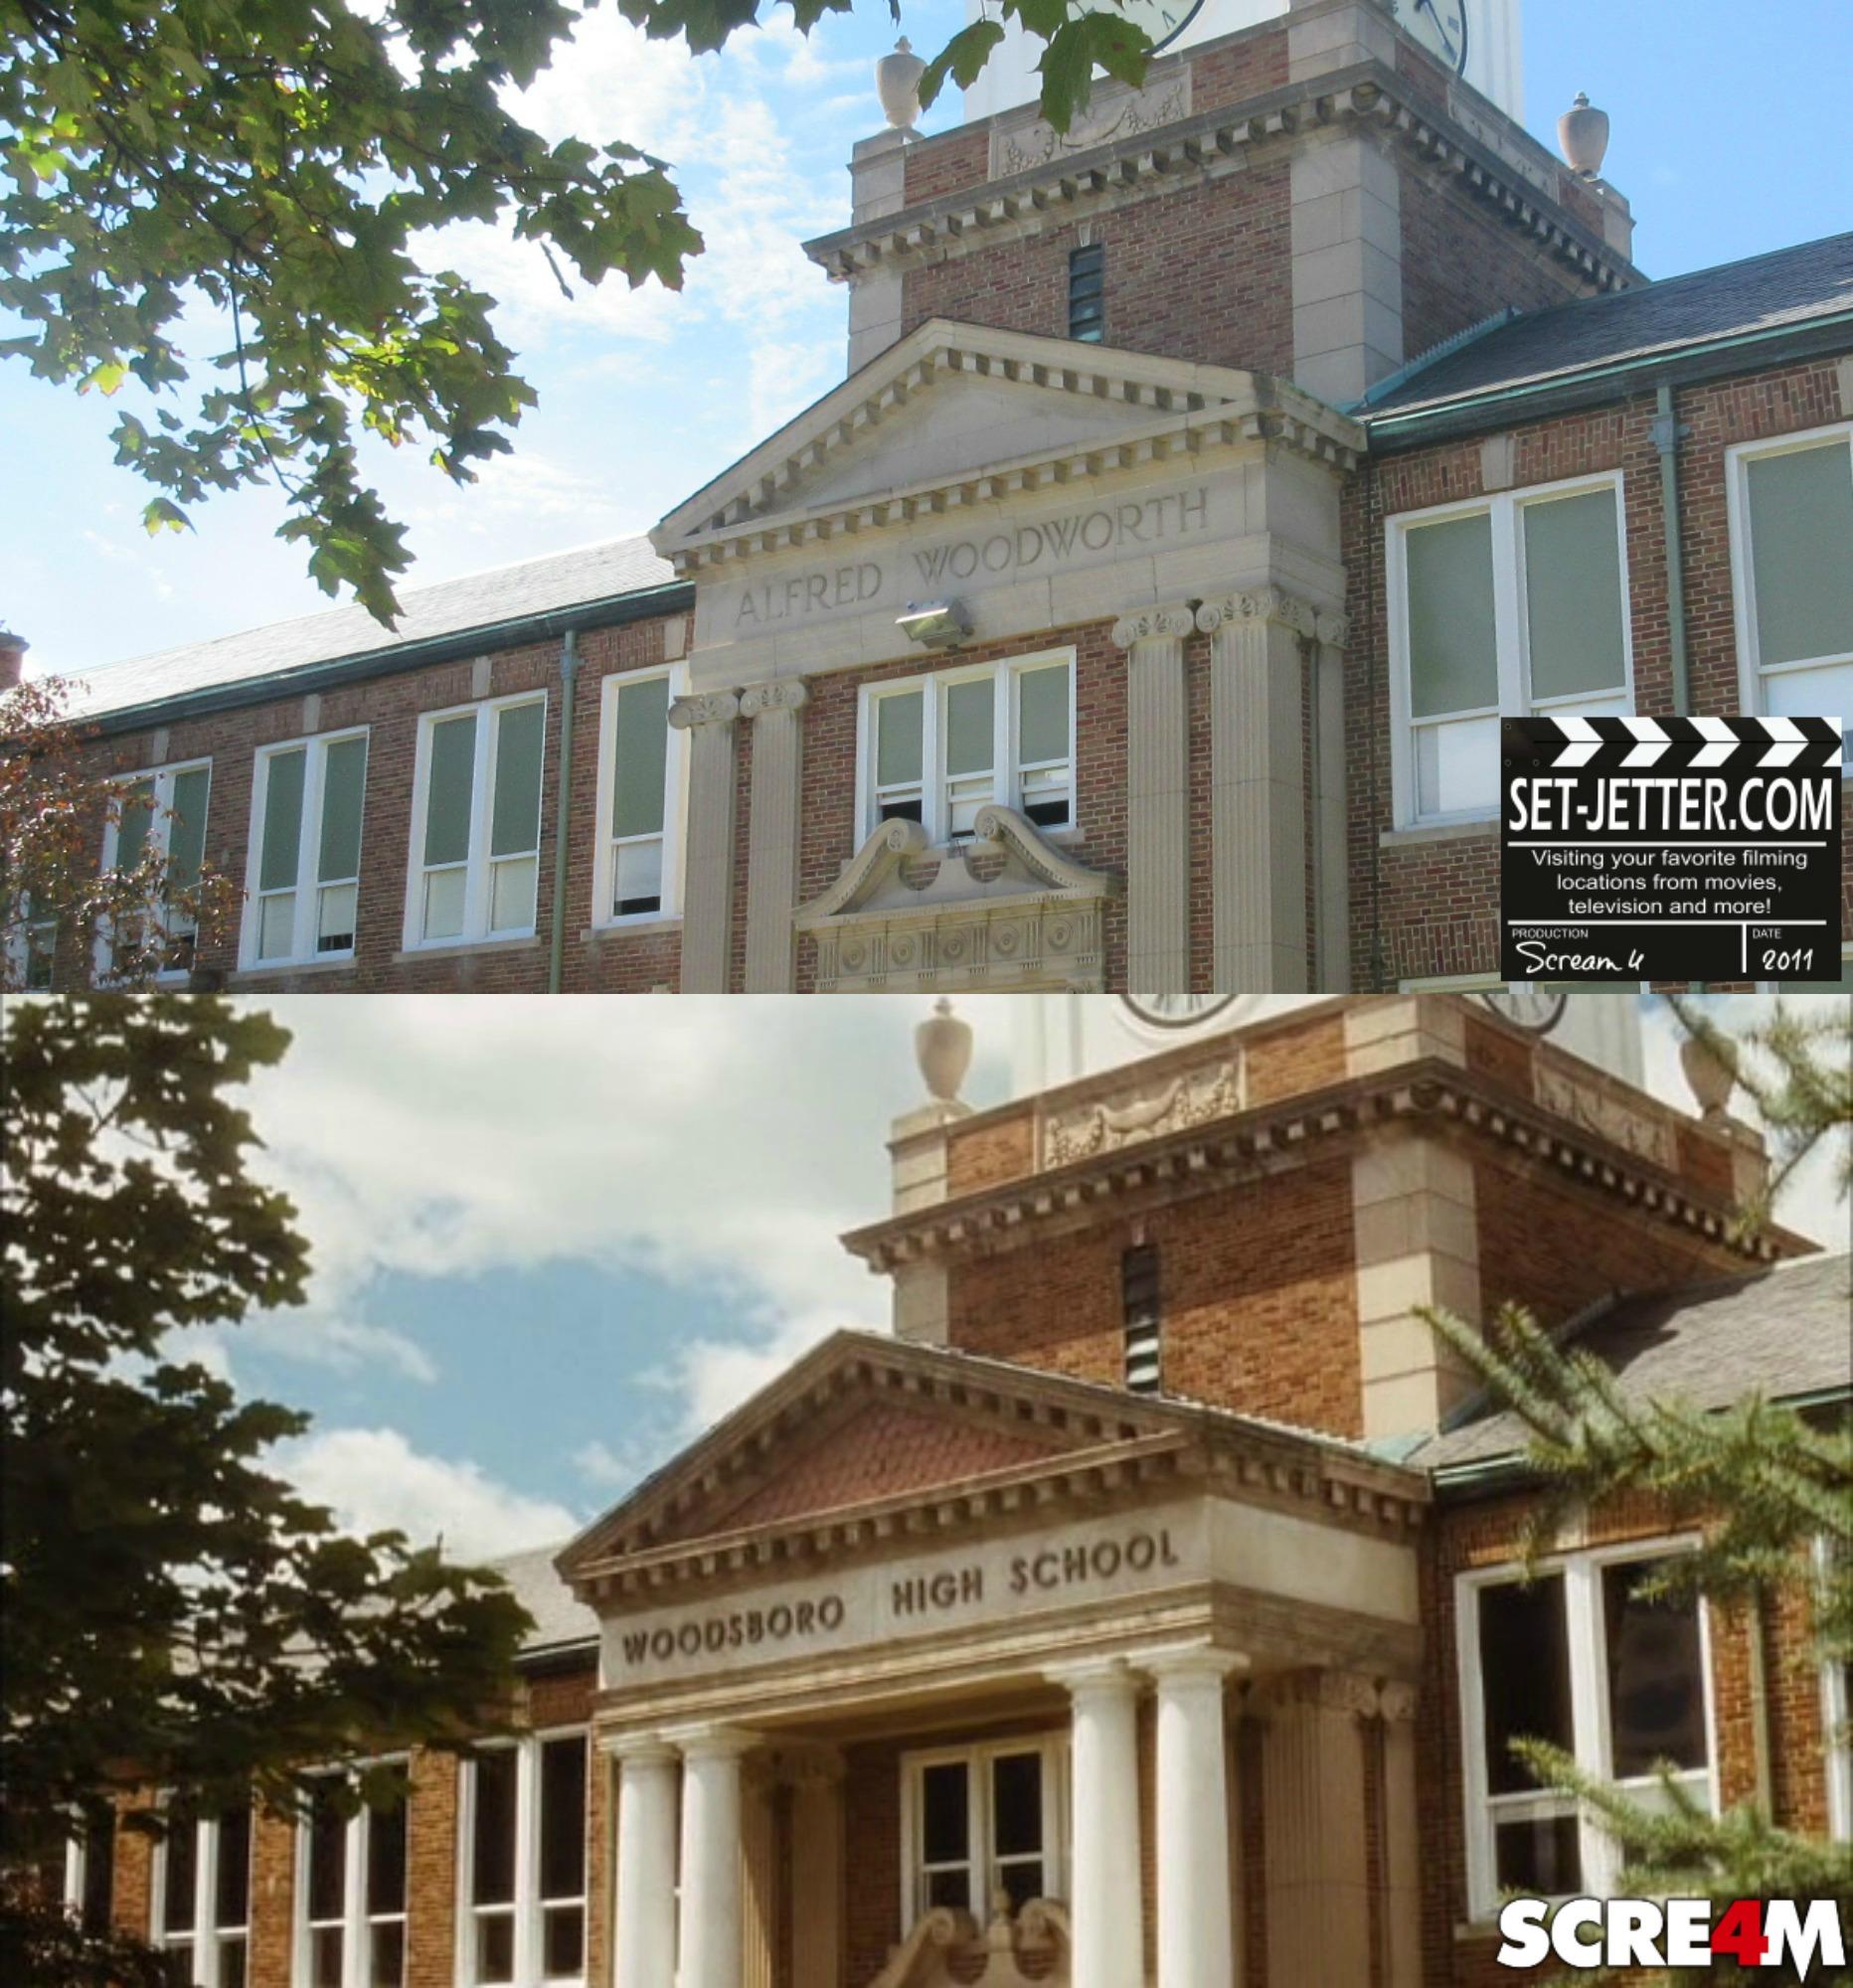 Scream4 comparison 53.jpg